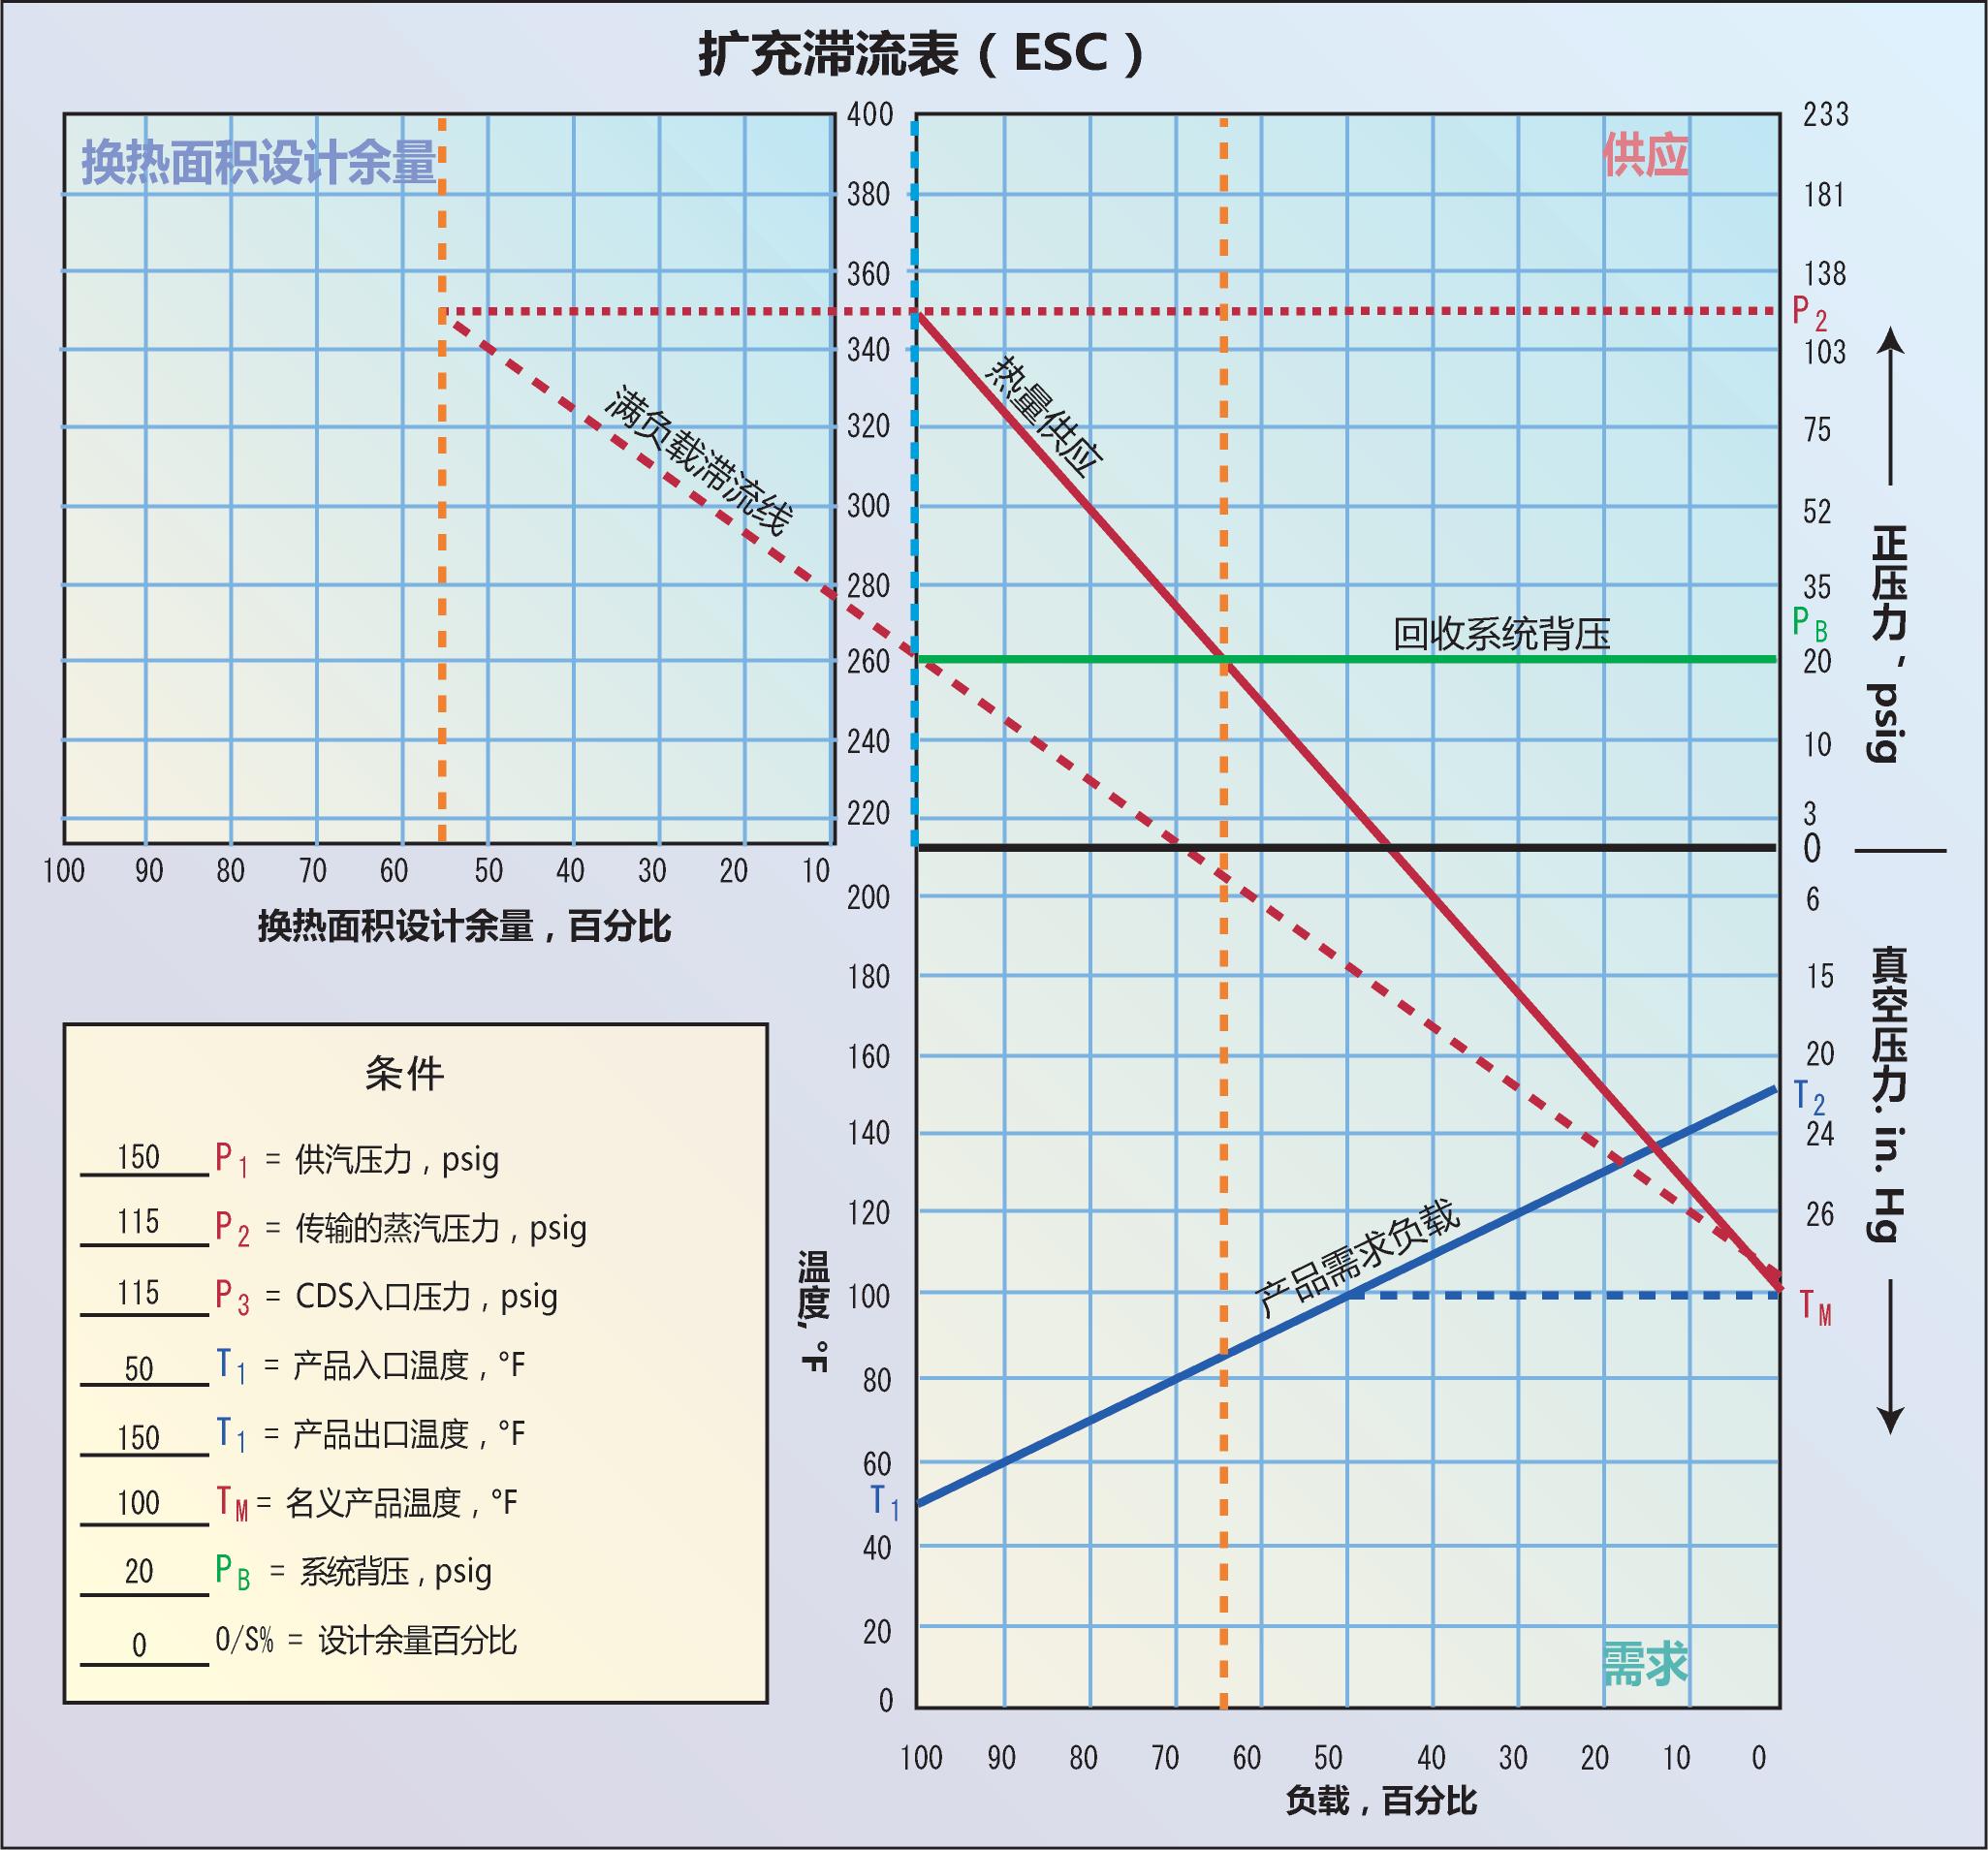 <strong>图4</strong> 从右侧需求象限纵轴上找到TM,通过TM向左上方穿过PB线(背压线)与供应象限左侧纵轴线的交点画一条延伸线,最后在设计余量象限中与P2的延长线相交。